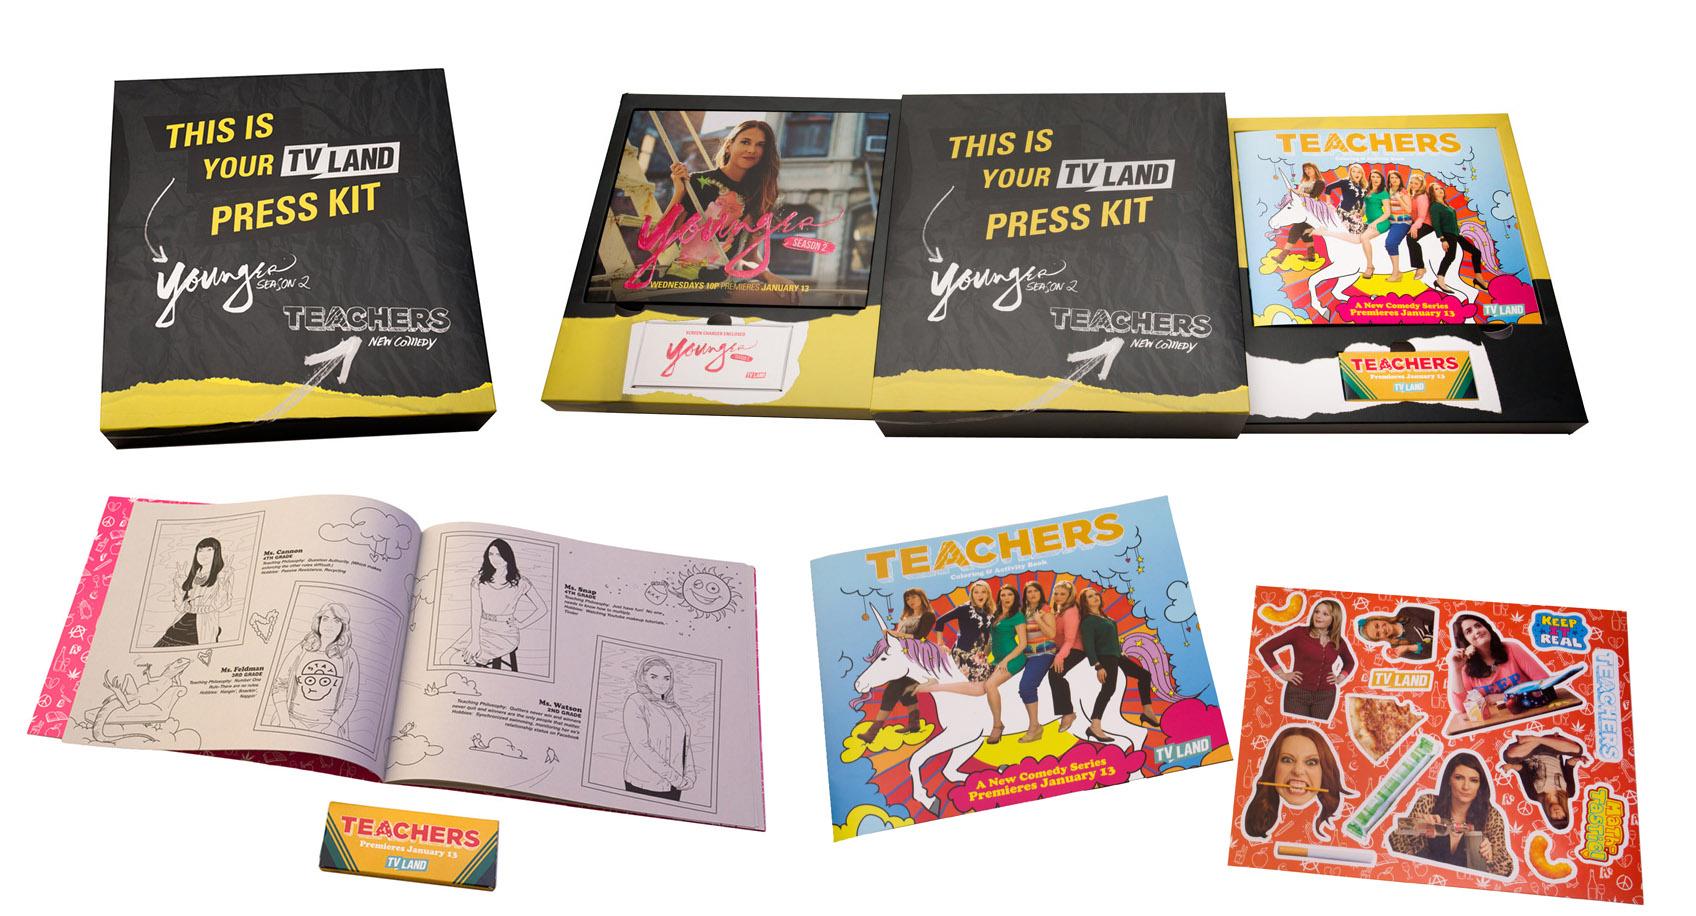 Younger/Teachers press kit